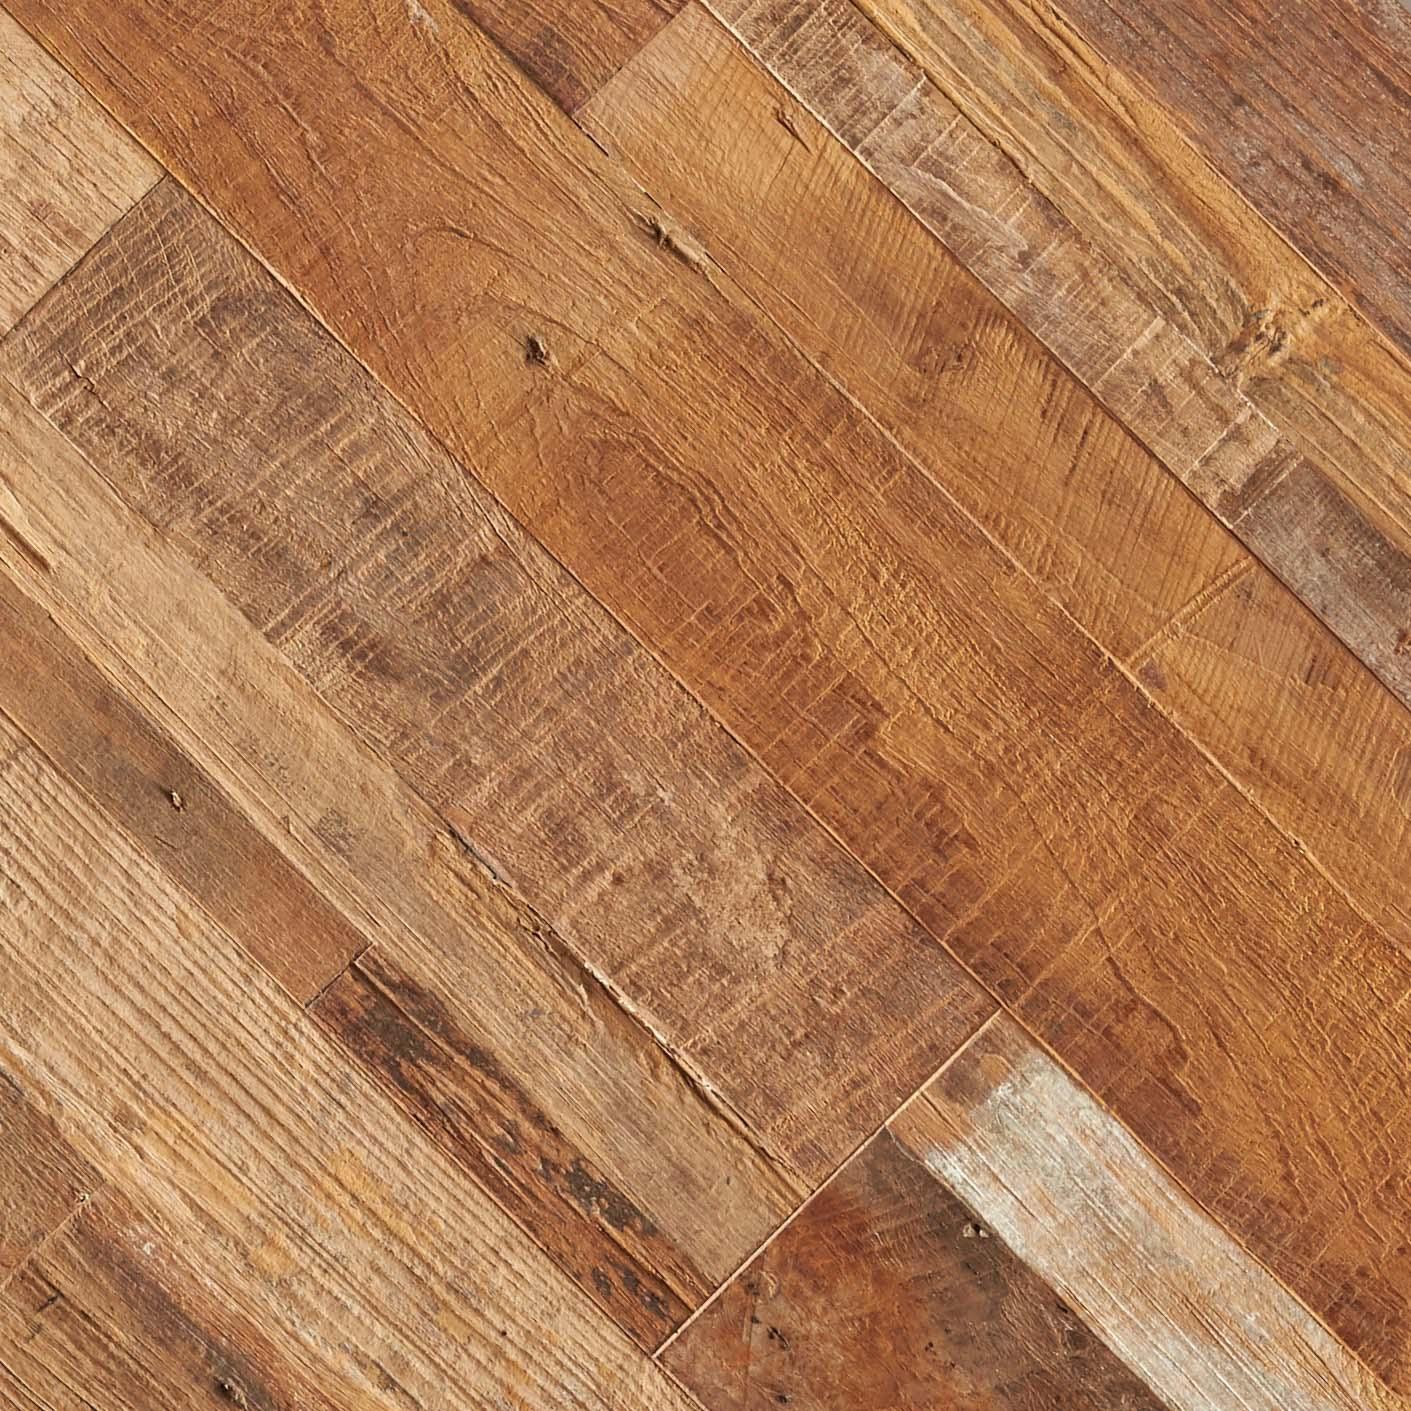 multistrip patina detail - Reclaimed Teak Flooring